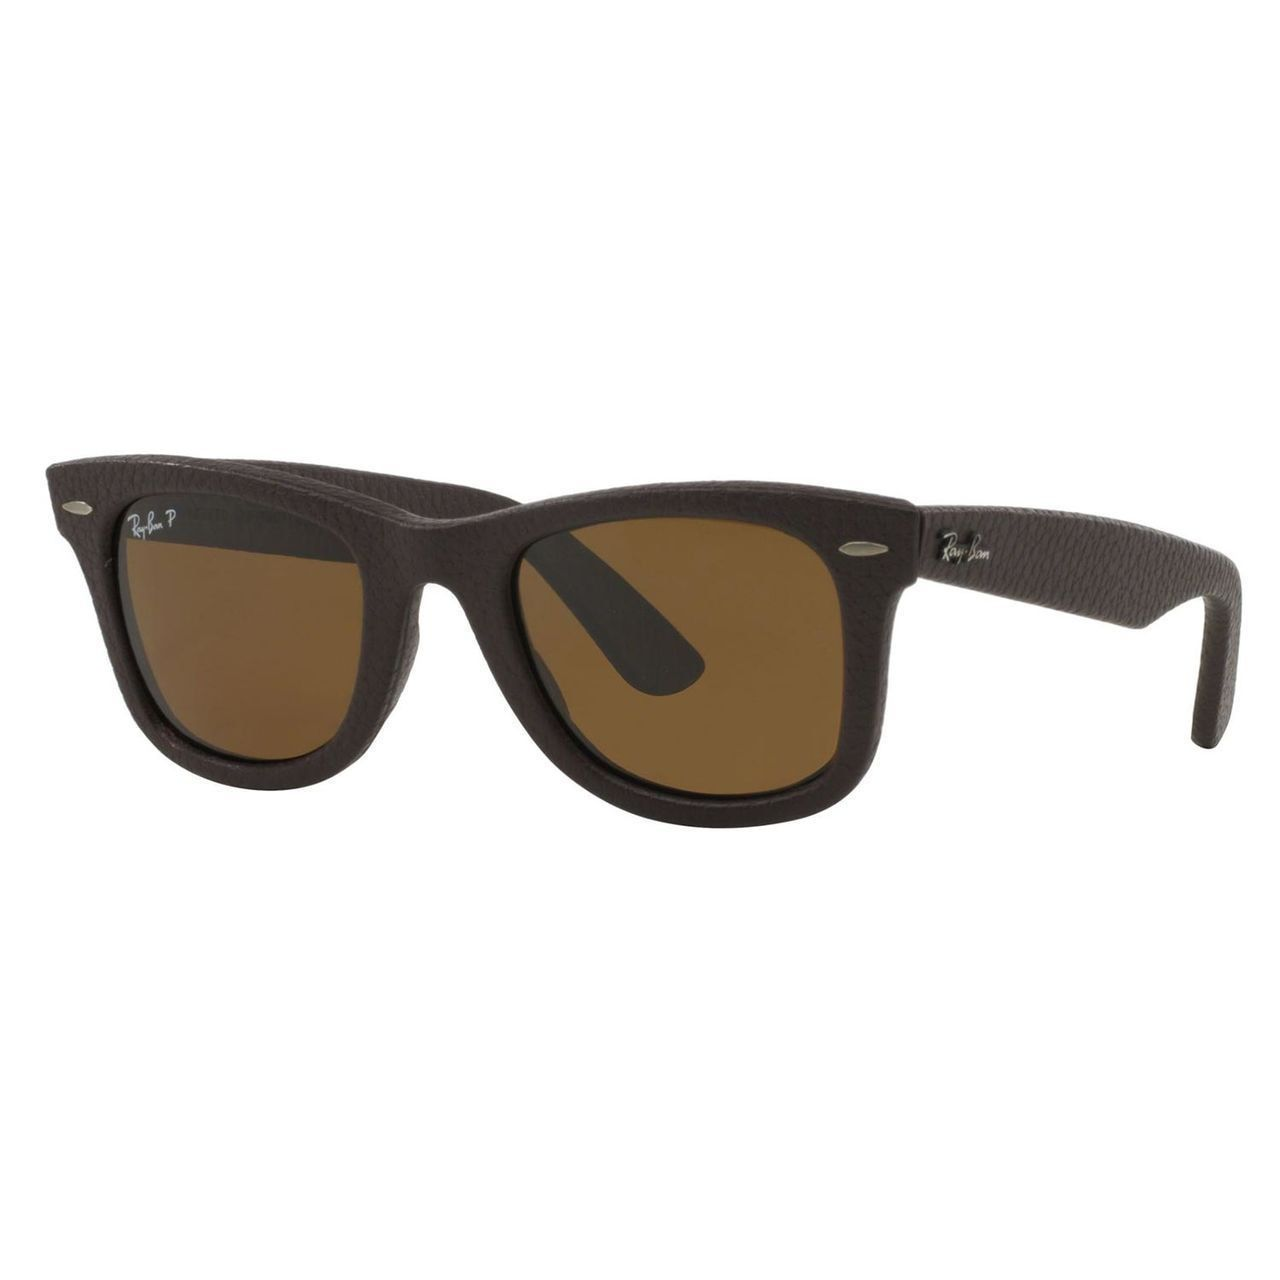 ray ban wayfarer sunglasses shop